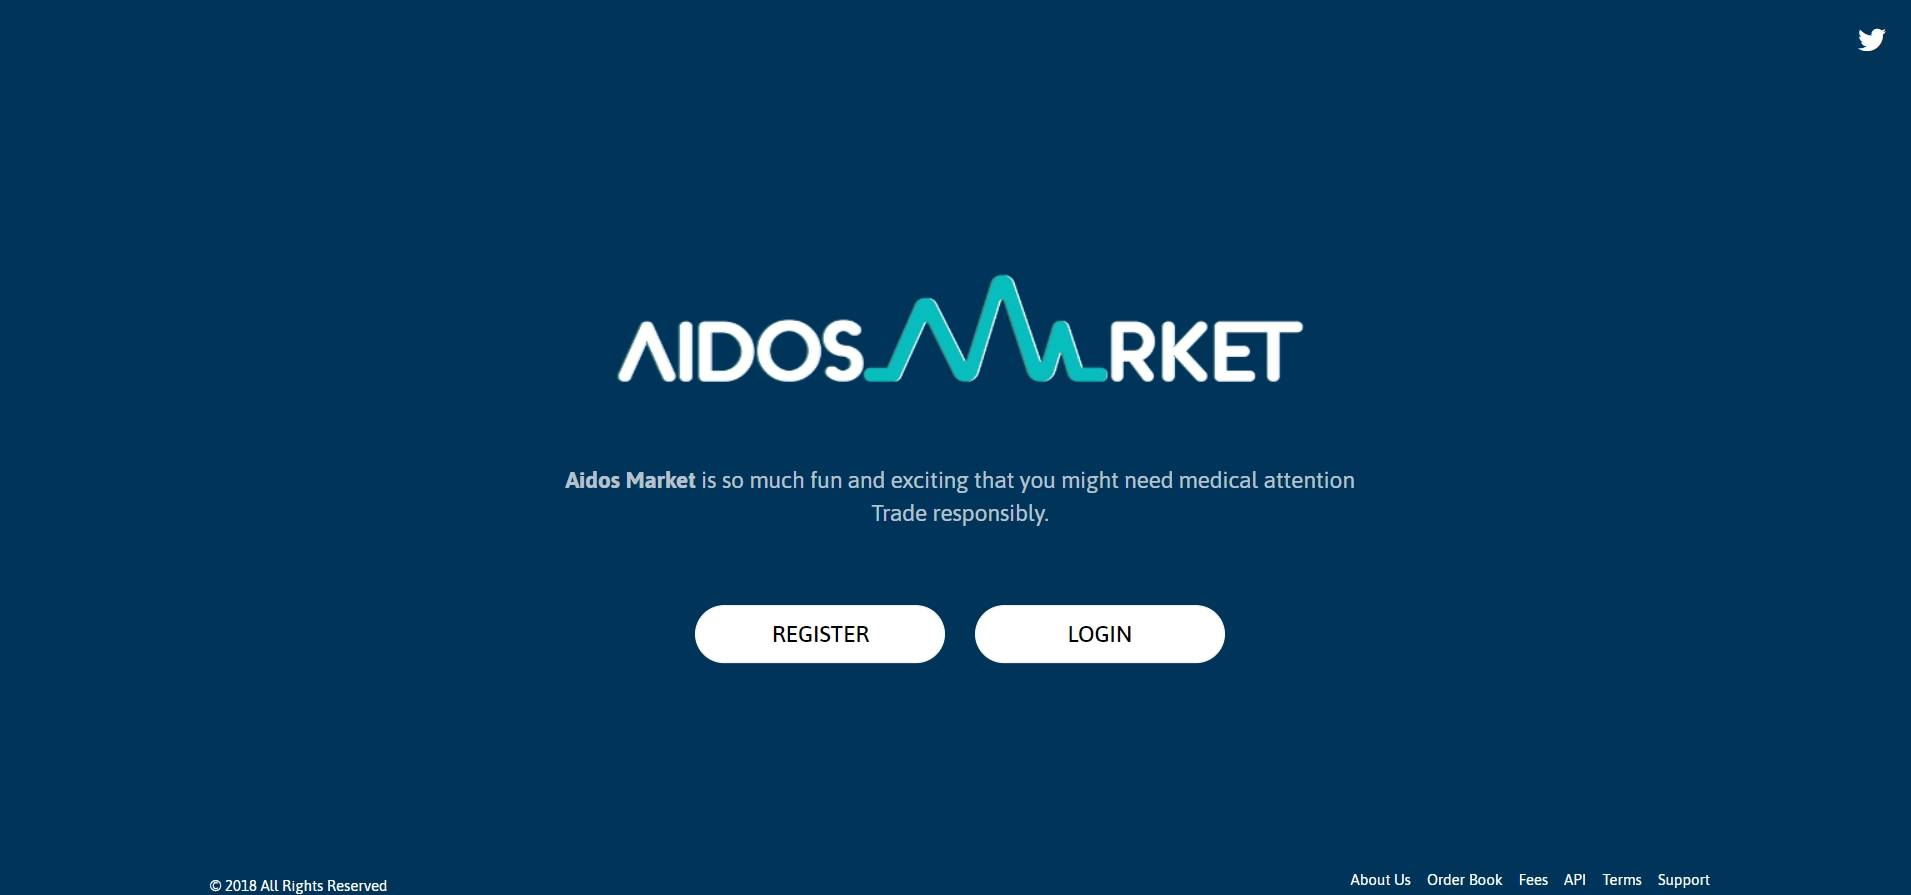 AidosMarket